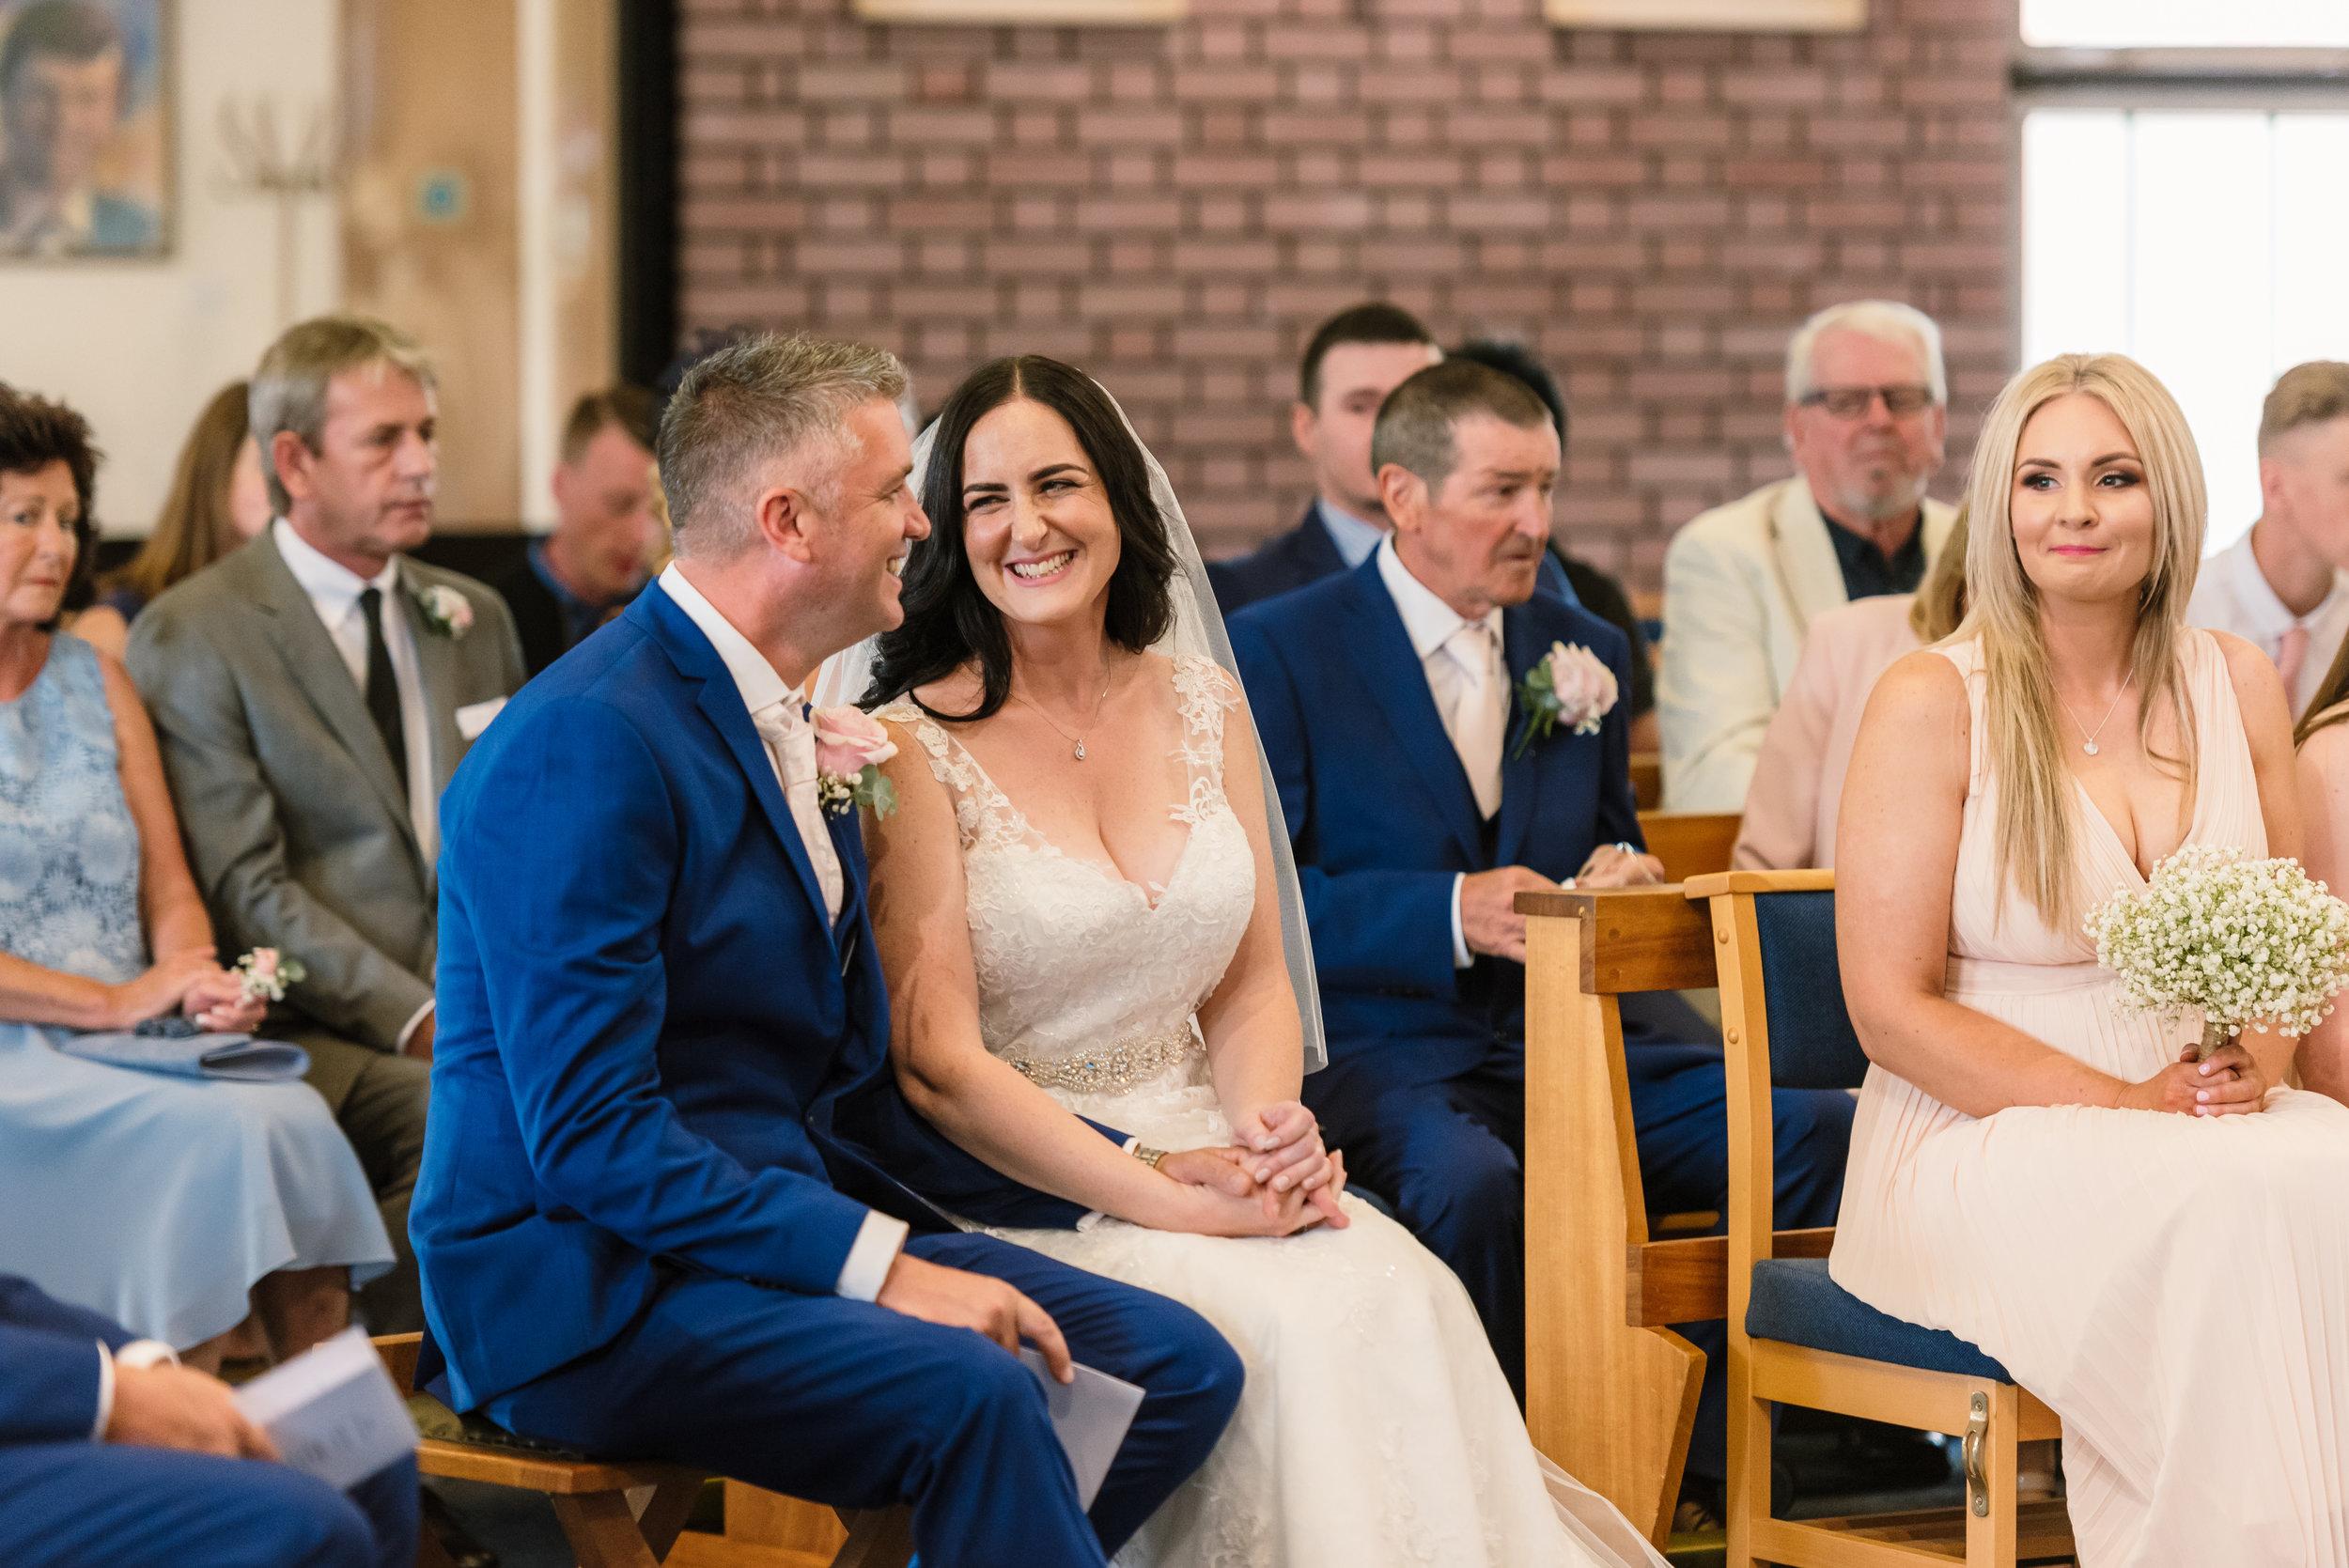 Sarah-Fishlock-Photography : Hampshire-wedding-photographer-hampshire : fleet-wedding-photographer-fleet : Meade-Hall-Wedding-Photographer : Meade-Hall-Wedding-Photos-450.jpg